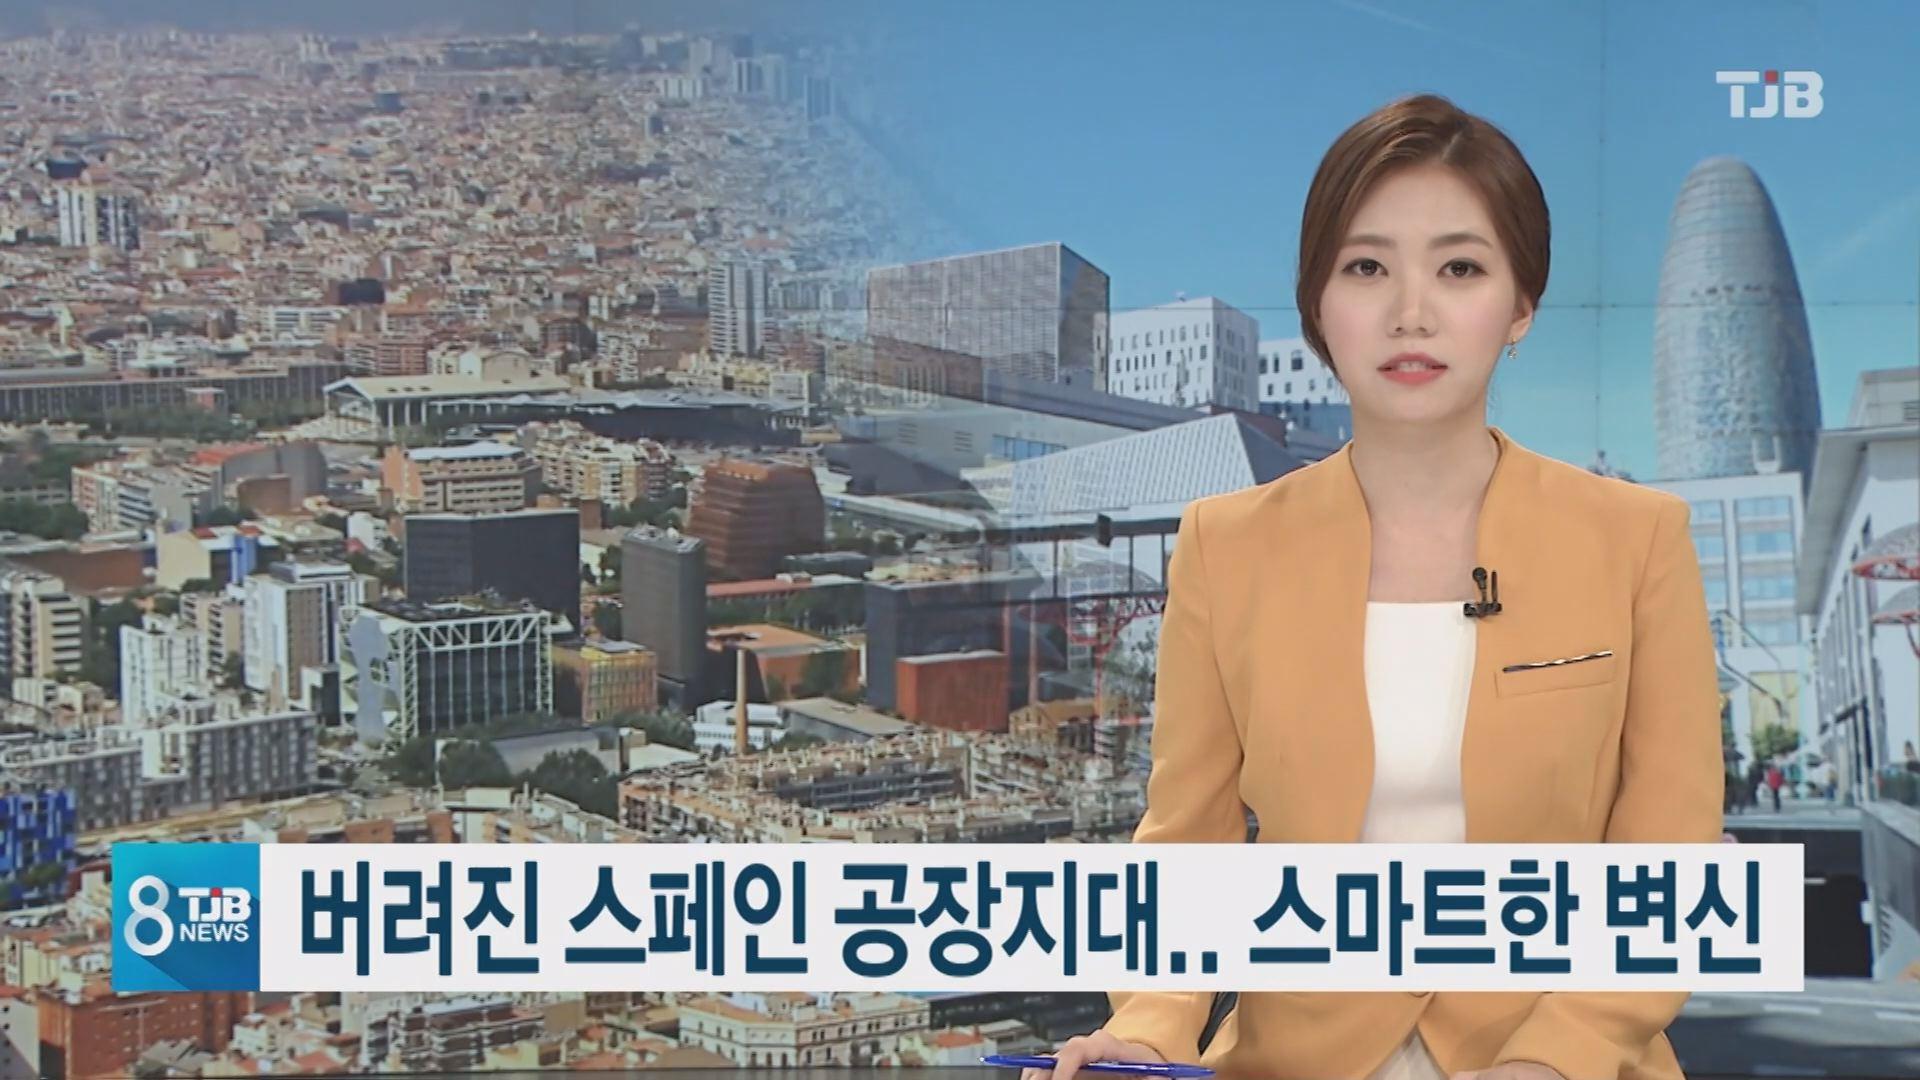 [TJB뉴스] 버려진 스페인 공장지대.. 스마트한 변신